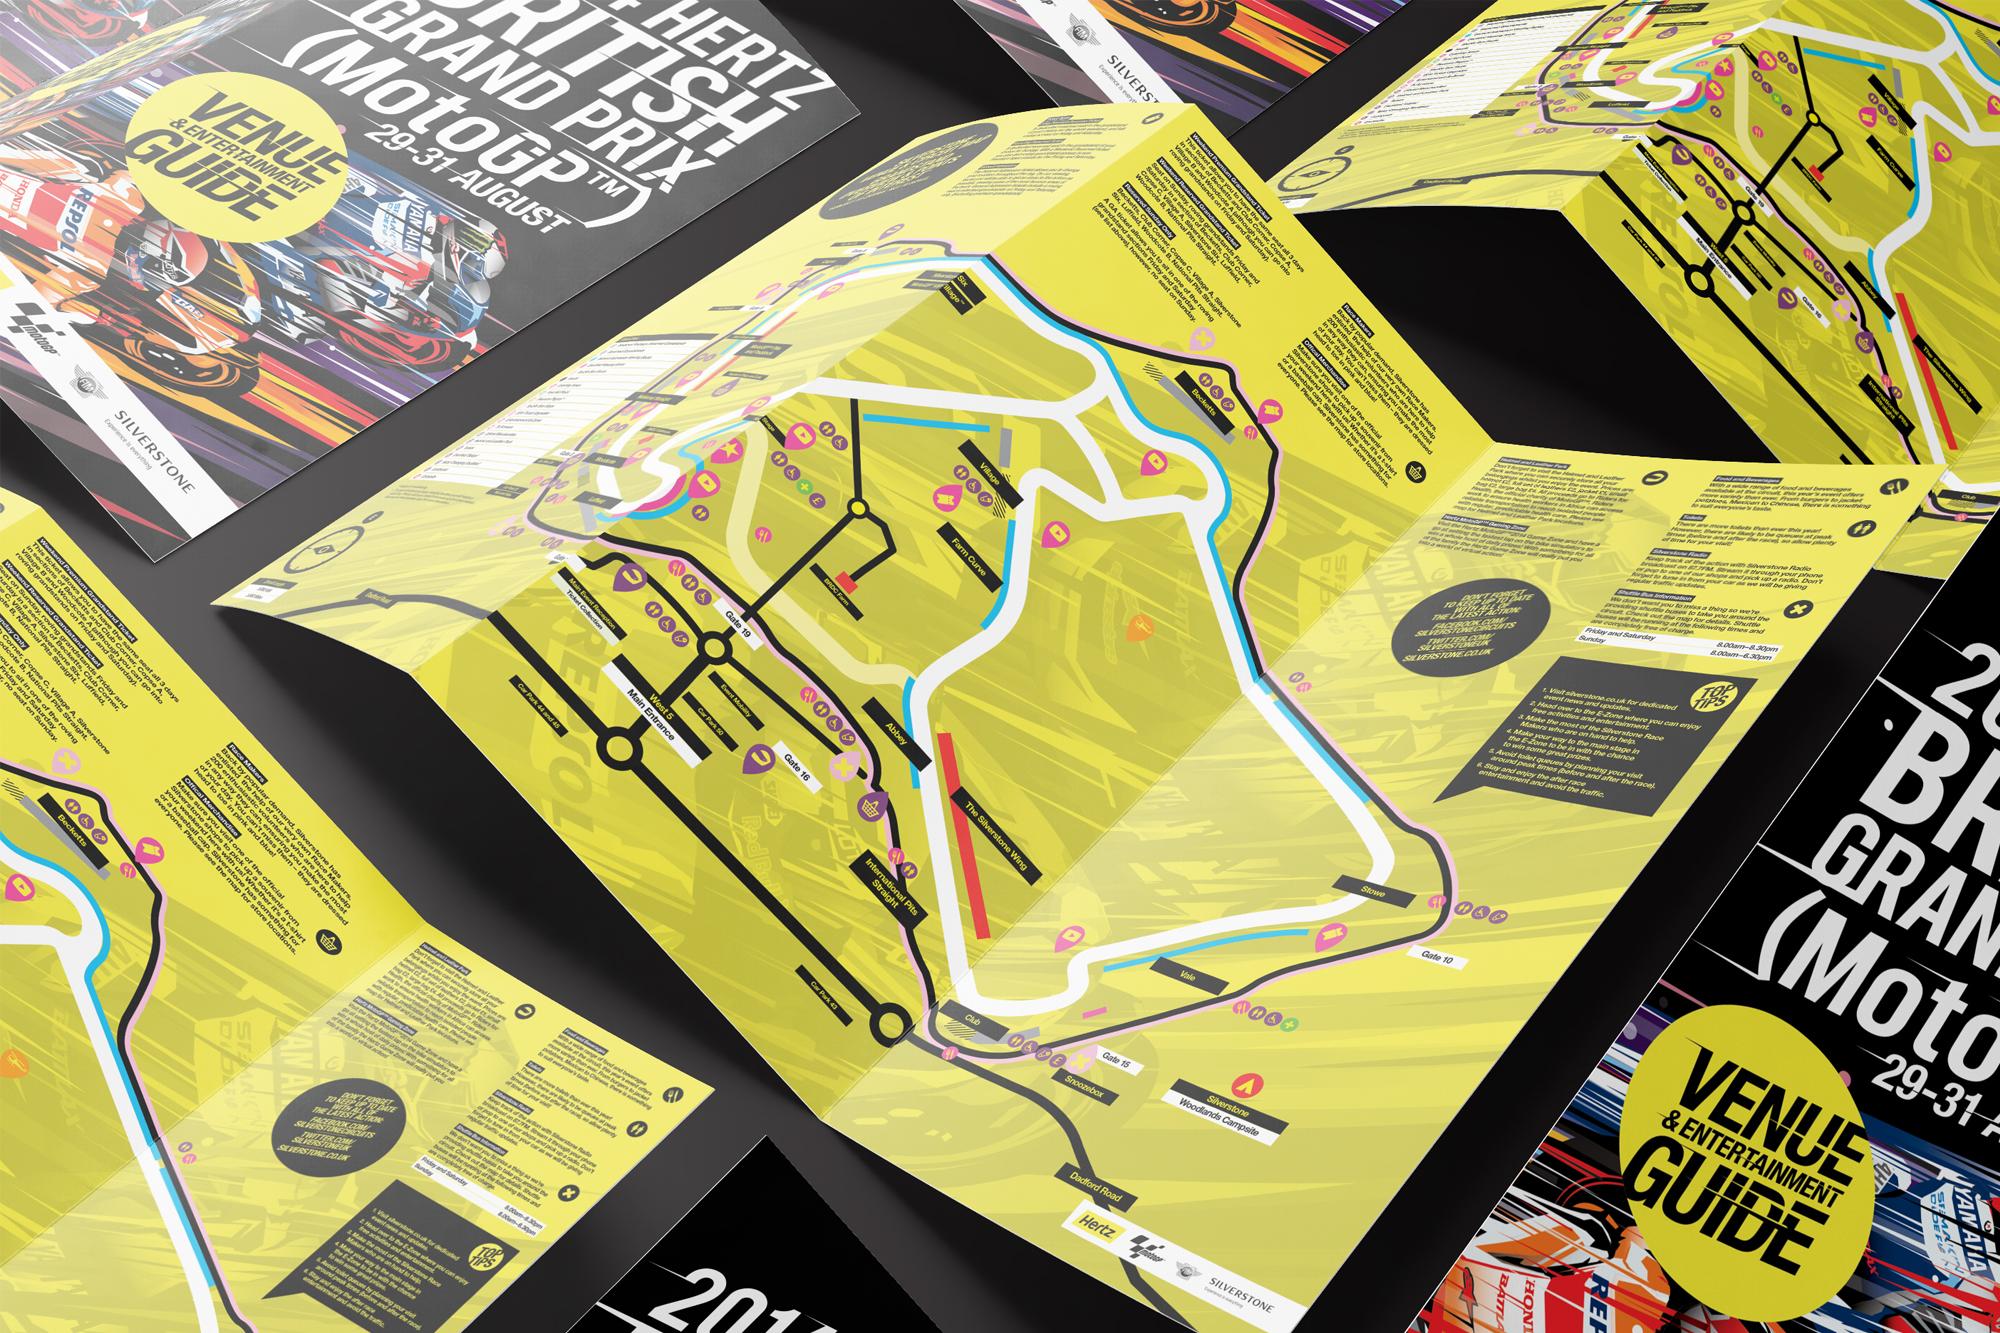 MotoGP_CaseStudies_IMAGES_3.jpg